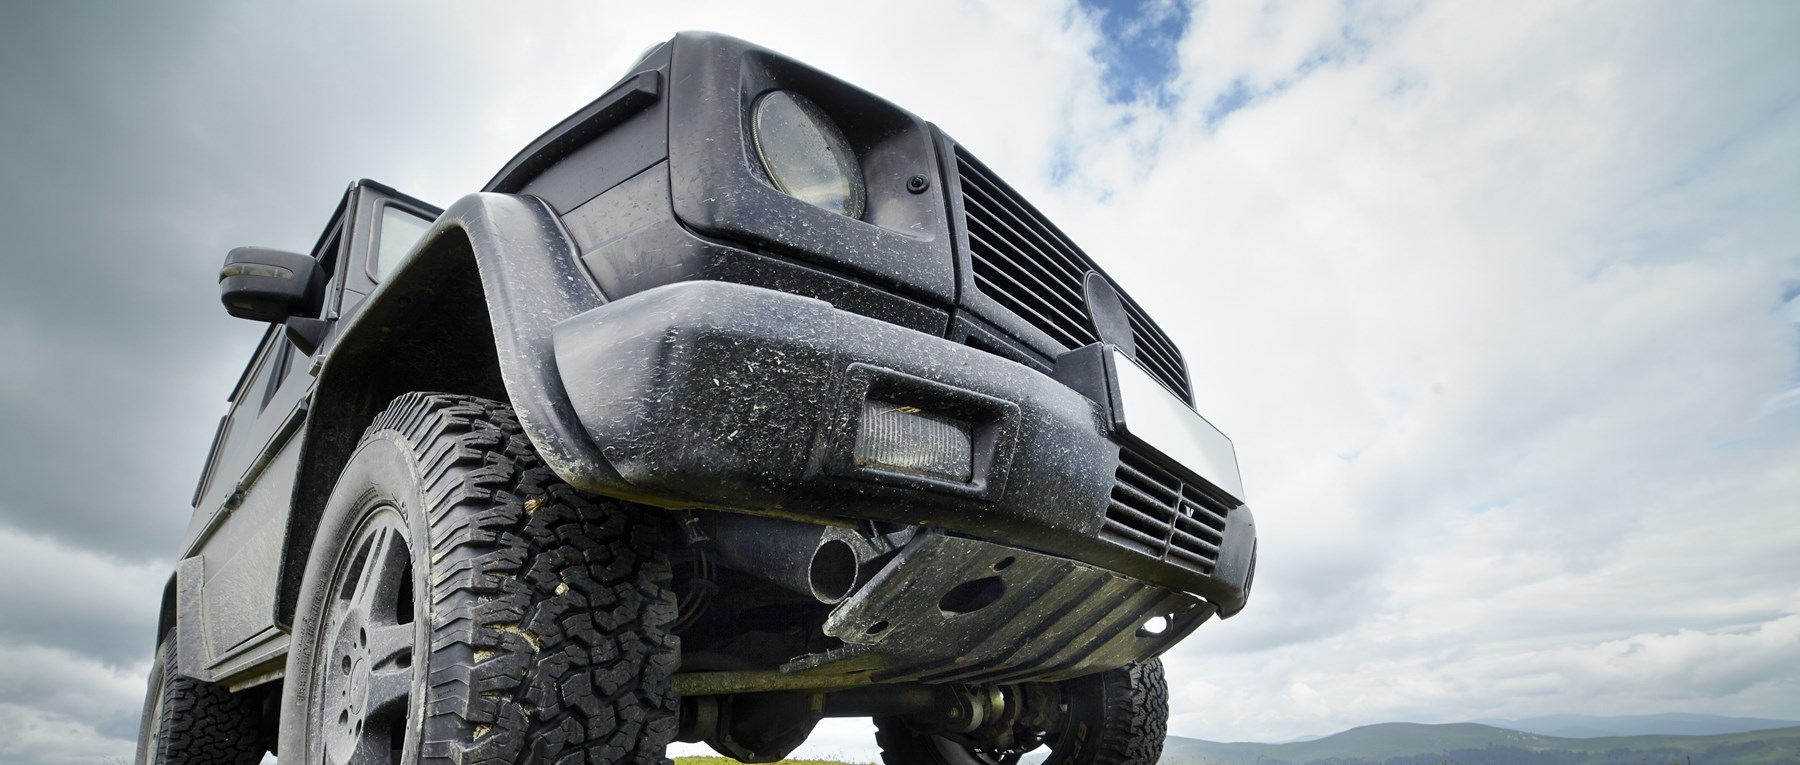 Black 4x4 car